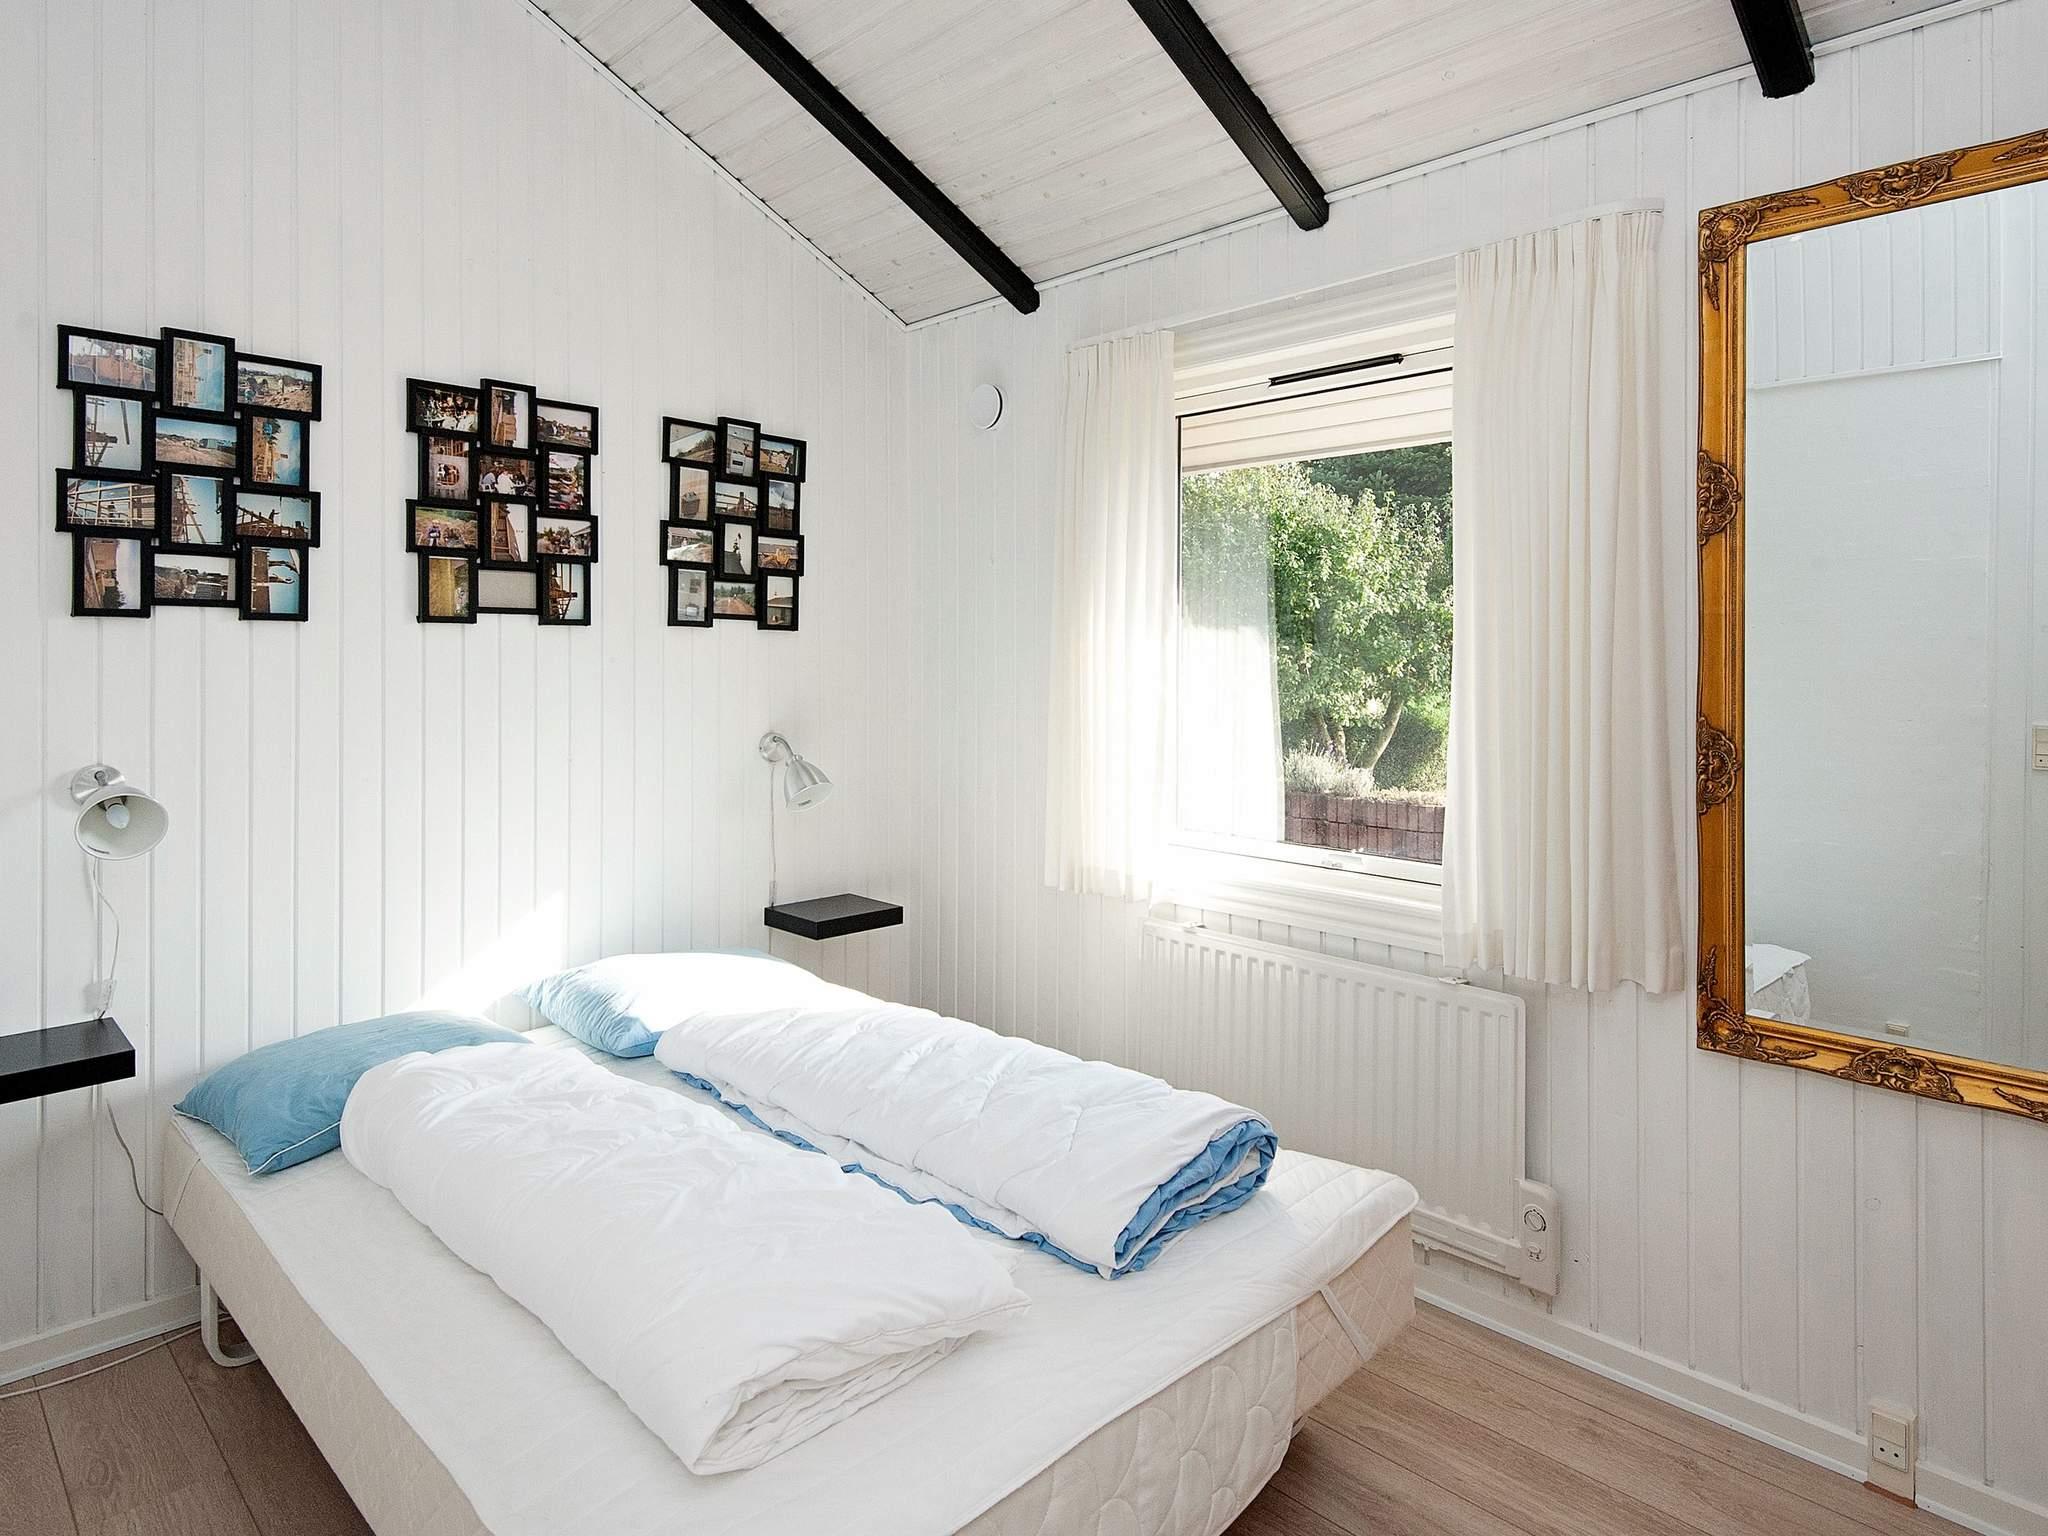 Ferienhaus Hejlsminde Strand (85685), Hejls, , Südostjütland, Dänemark, Bild 3